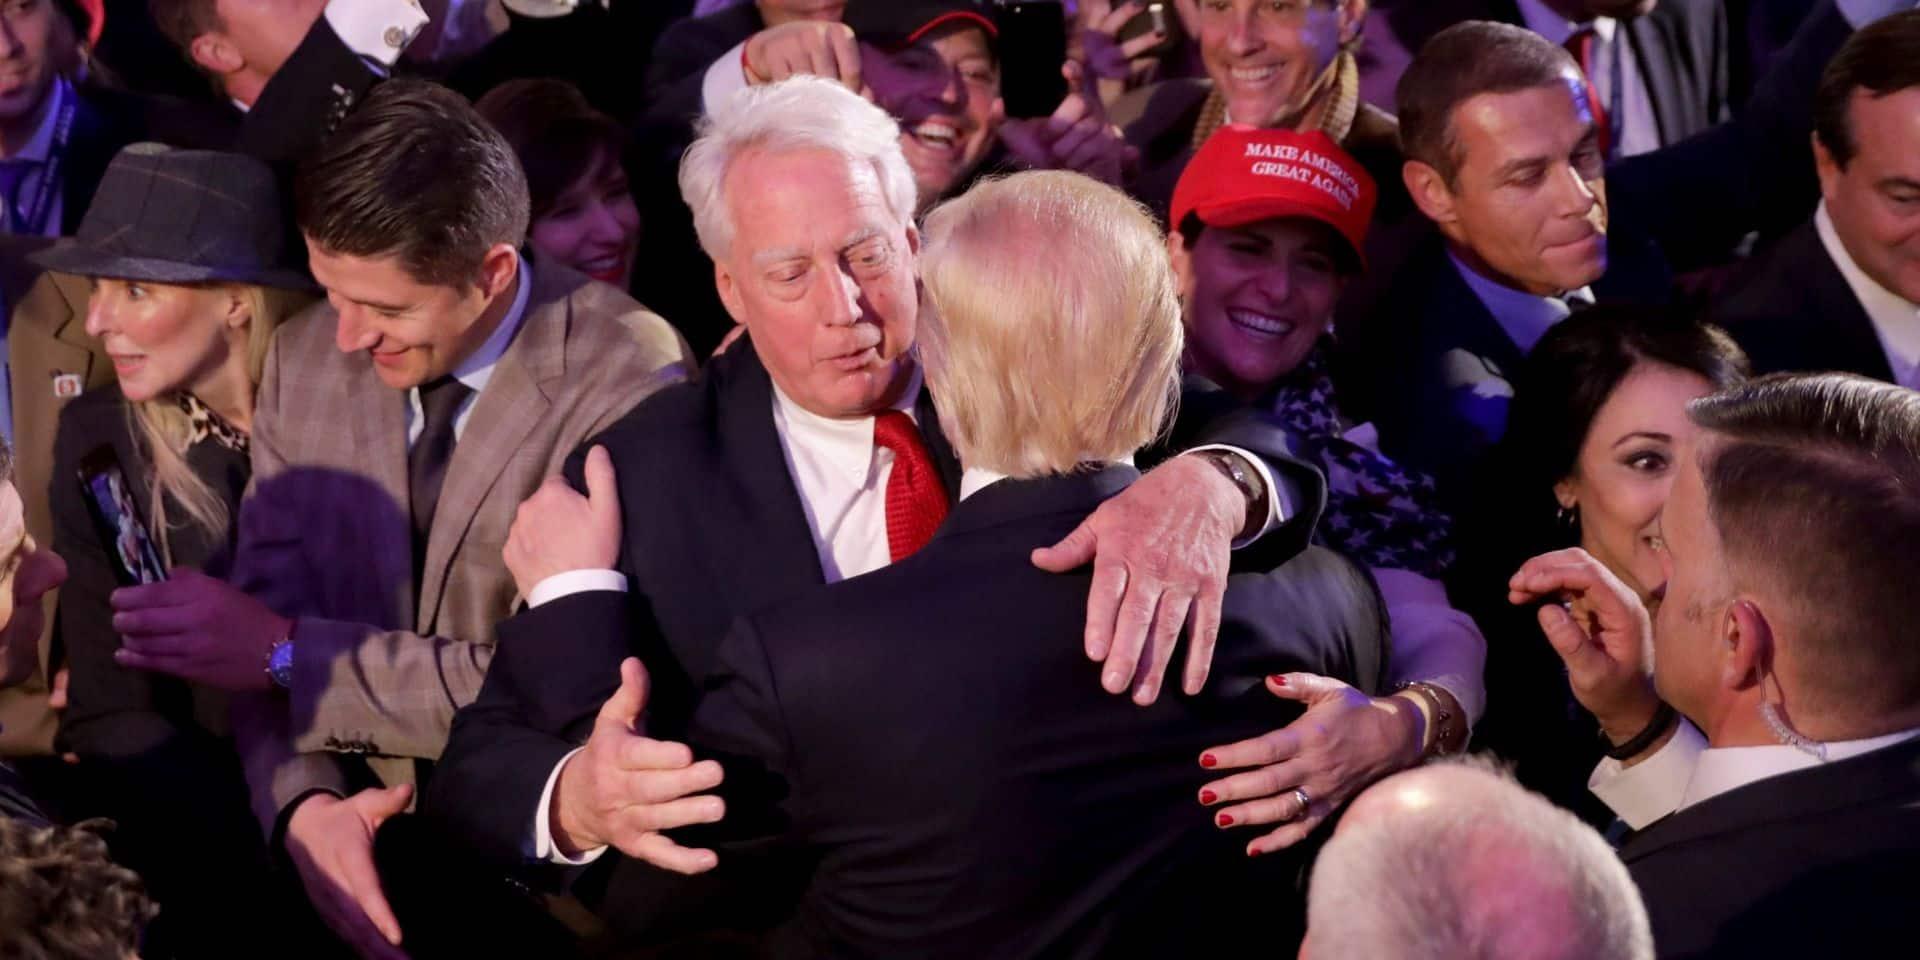 Robert Trump, frère cadet de Donald Trump, est décédé